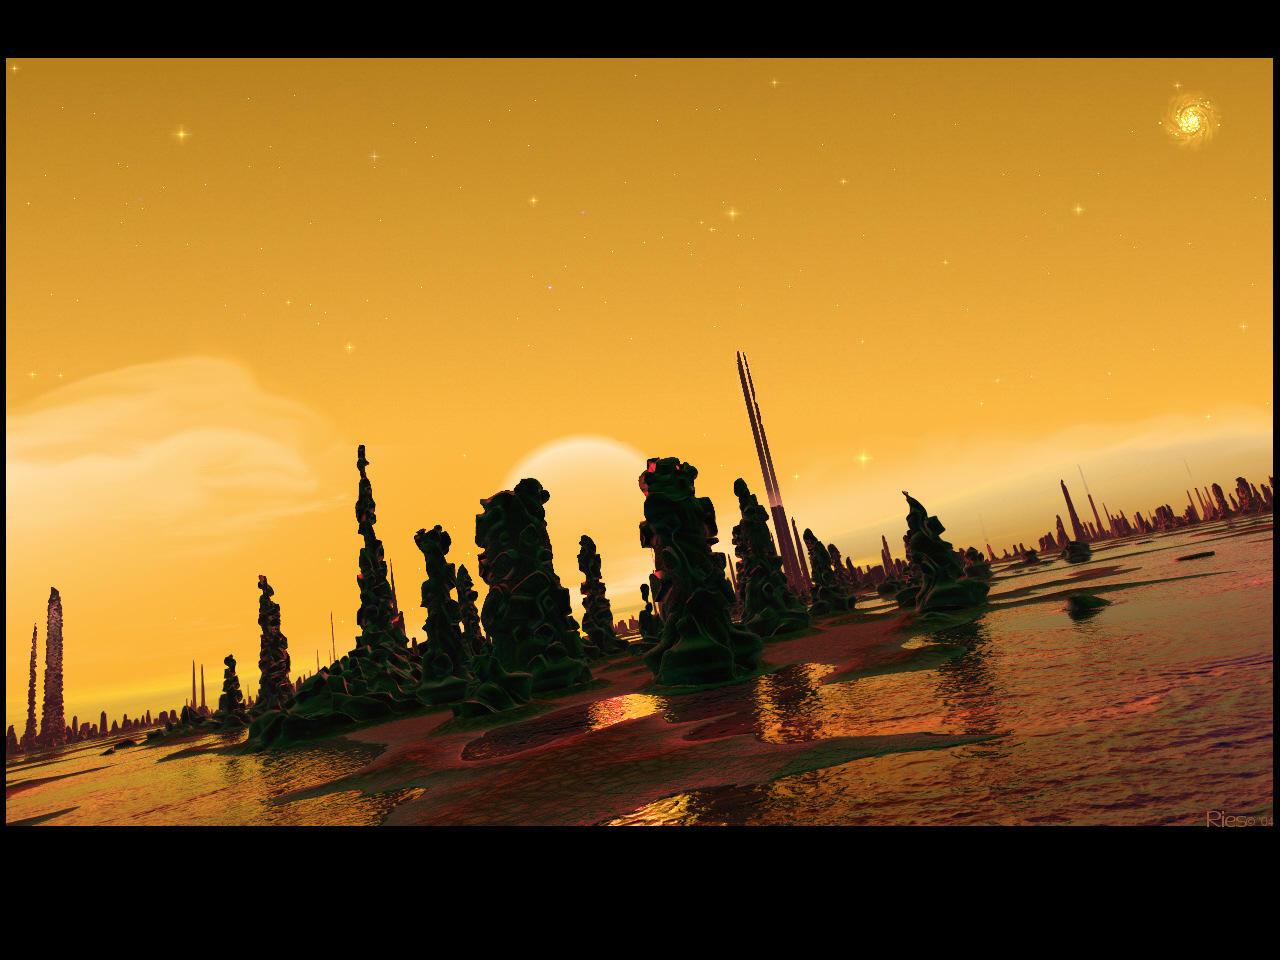 Alien Stonehenge by Casperium